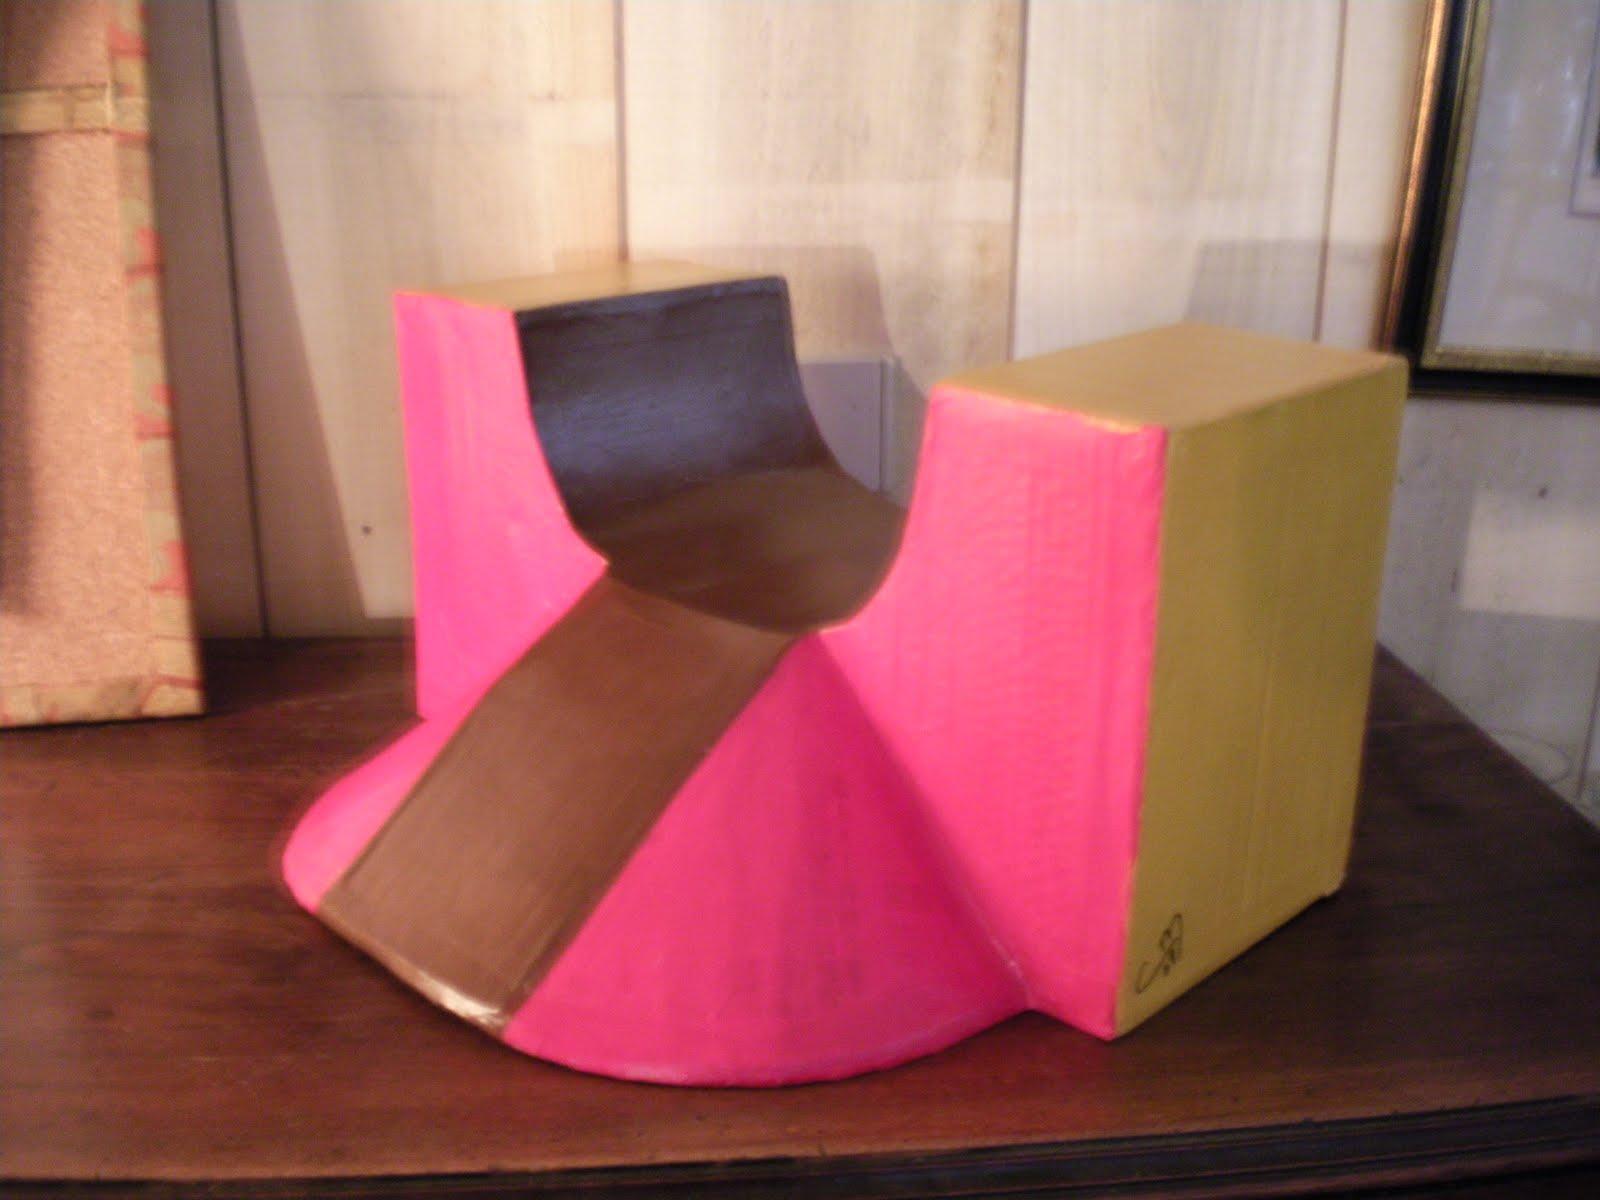 cartonnageco divers objets en carton rampe de mini skate 20 petit l. Black Bedroom Furniture Sets. Home Design Ideas